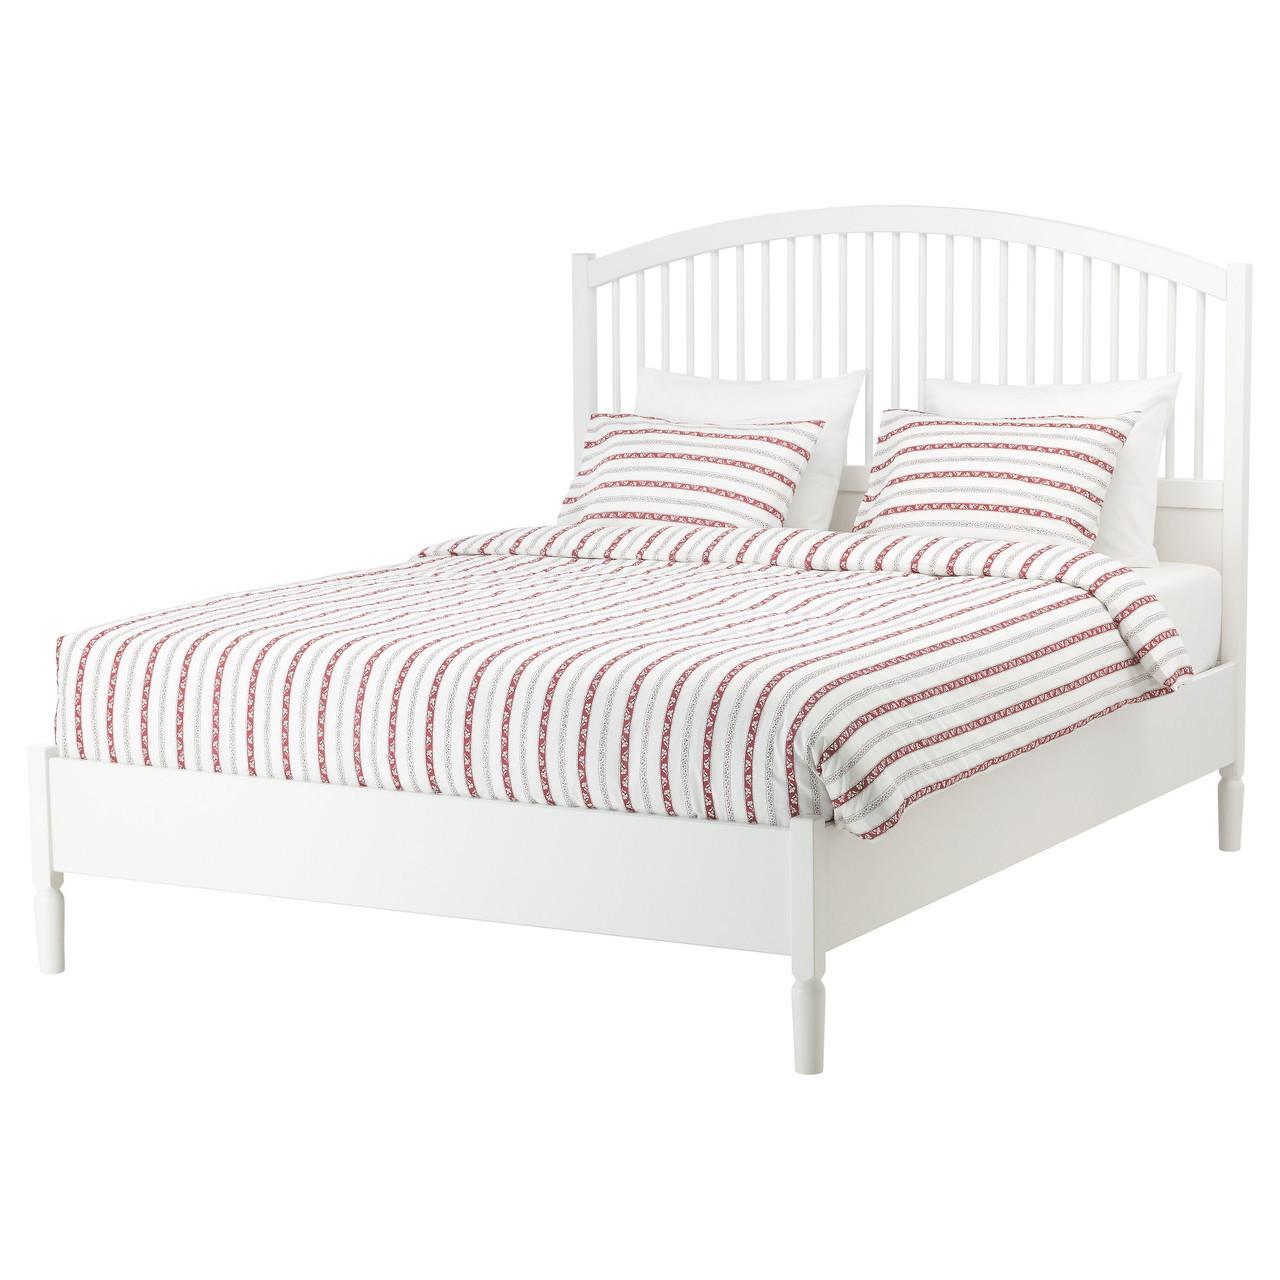 Каркас кровати IKEA TYSSEDAL 160x200 см белый 590.577.30